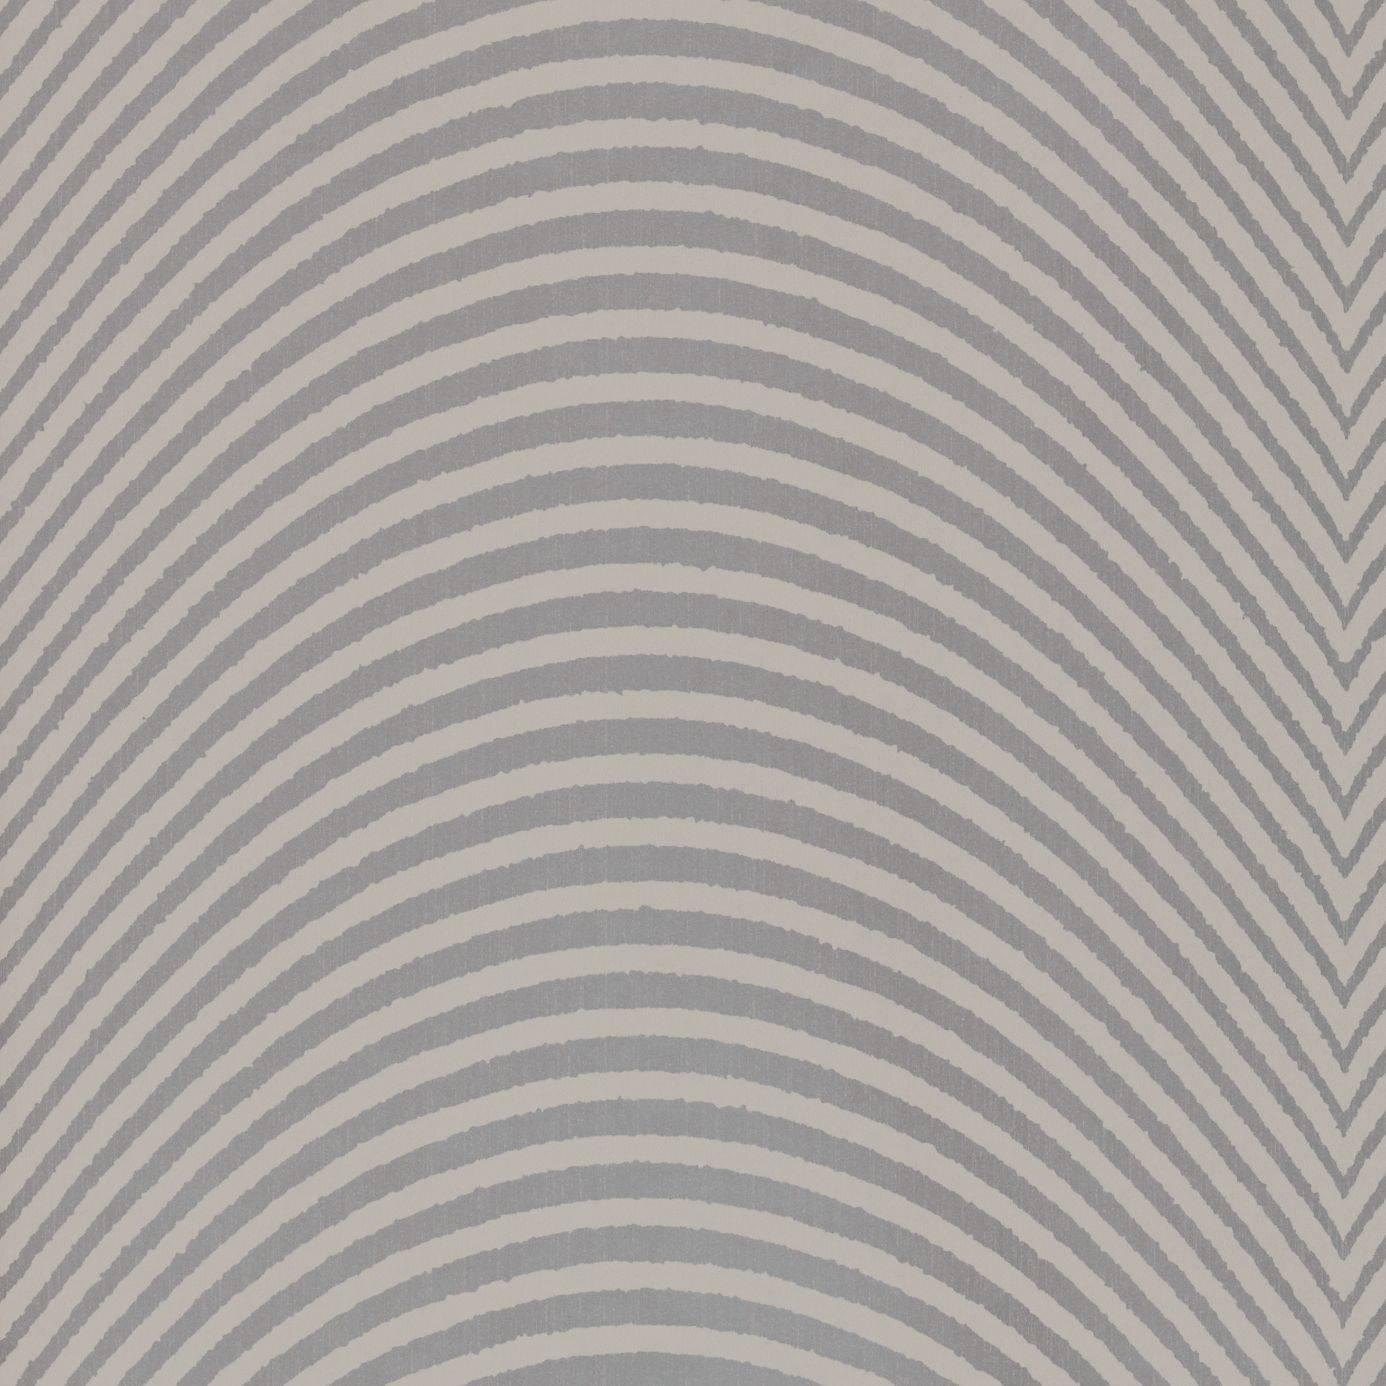 Home Wallpapers Harlequin Momentum Wallpapers Aspect Wallpaper 1386x1386